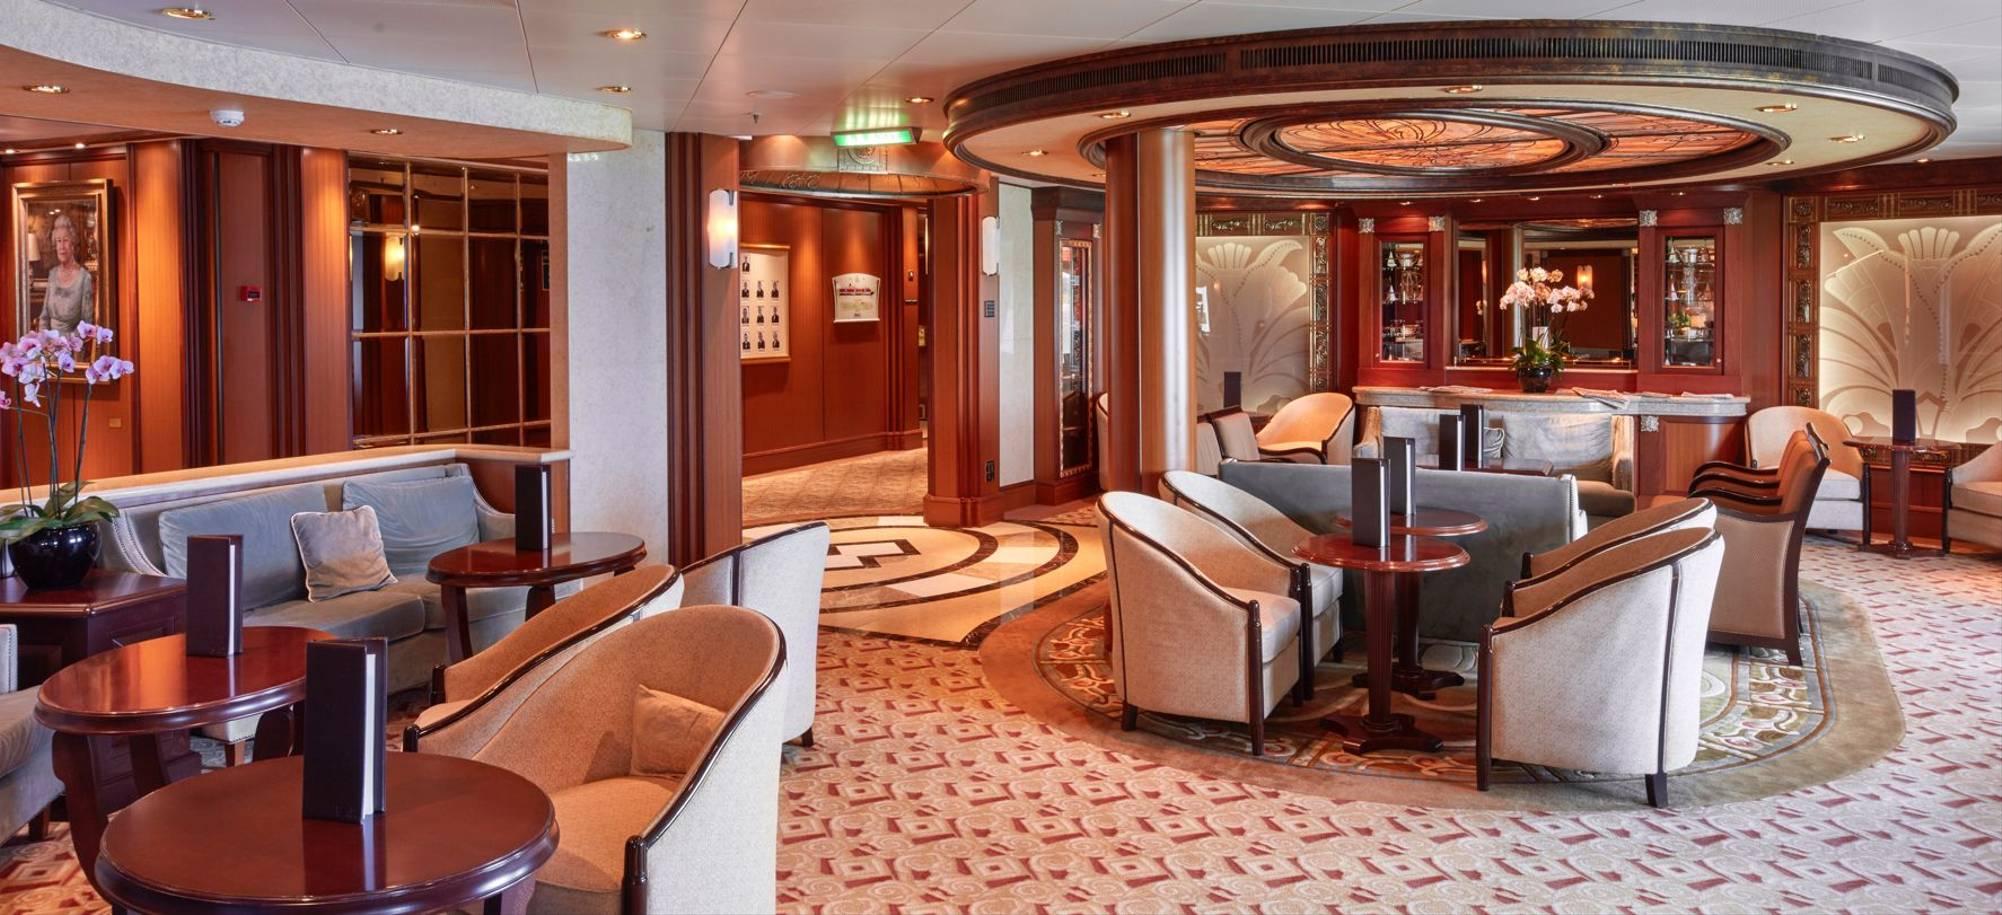 37 Day - At sea, Cafe Carinthia -  Itinerary Desktop copy.jpg